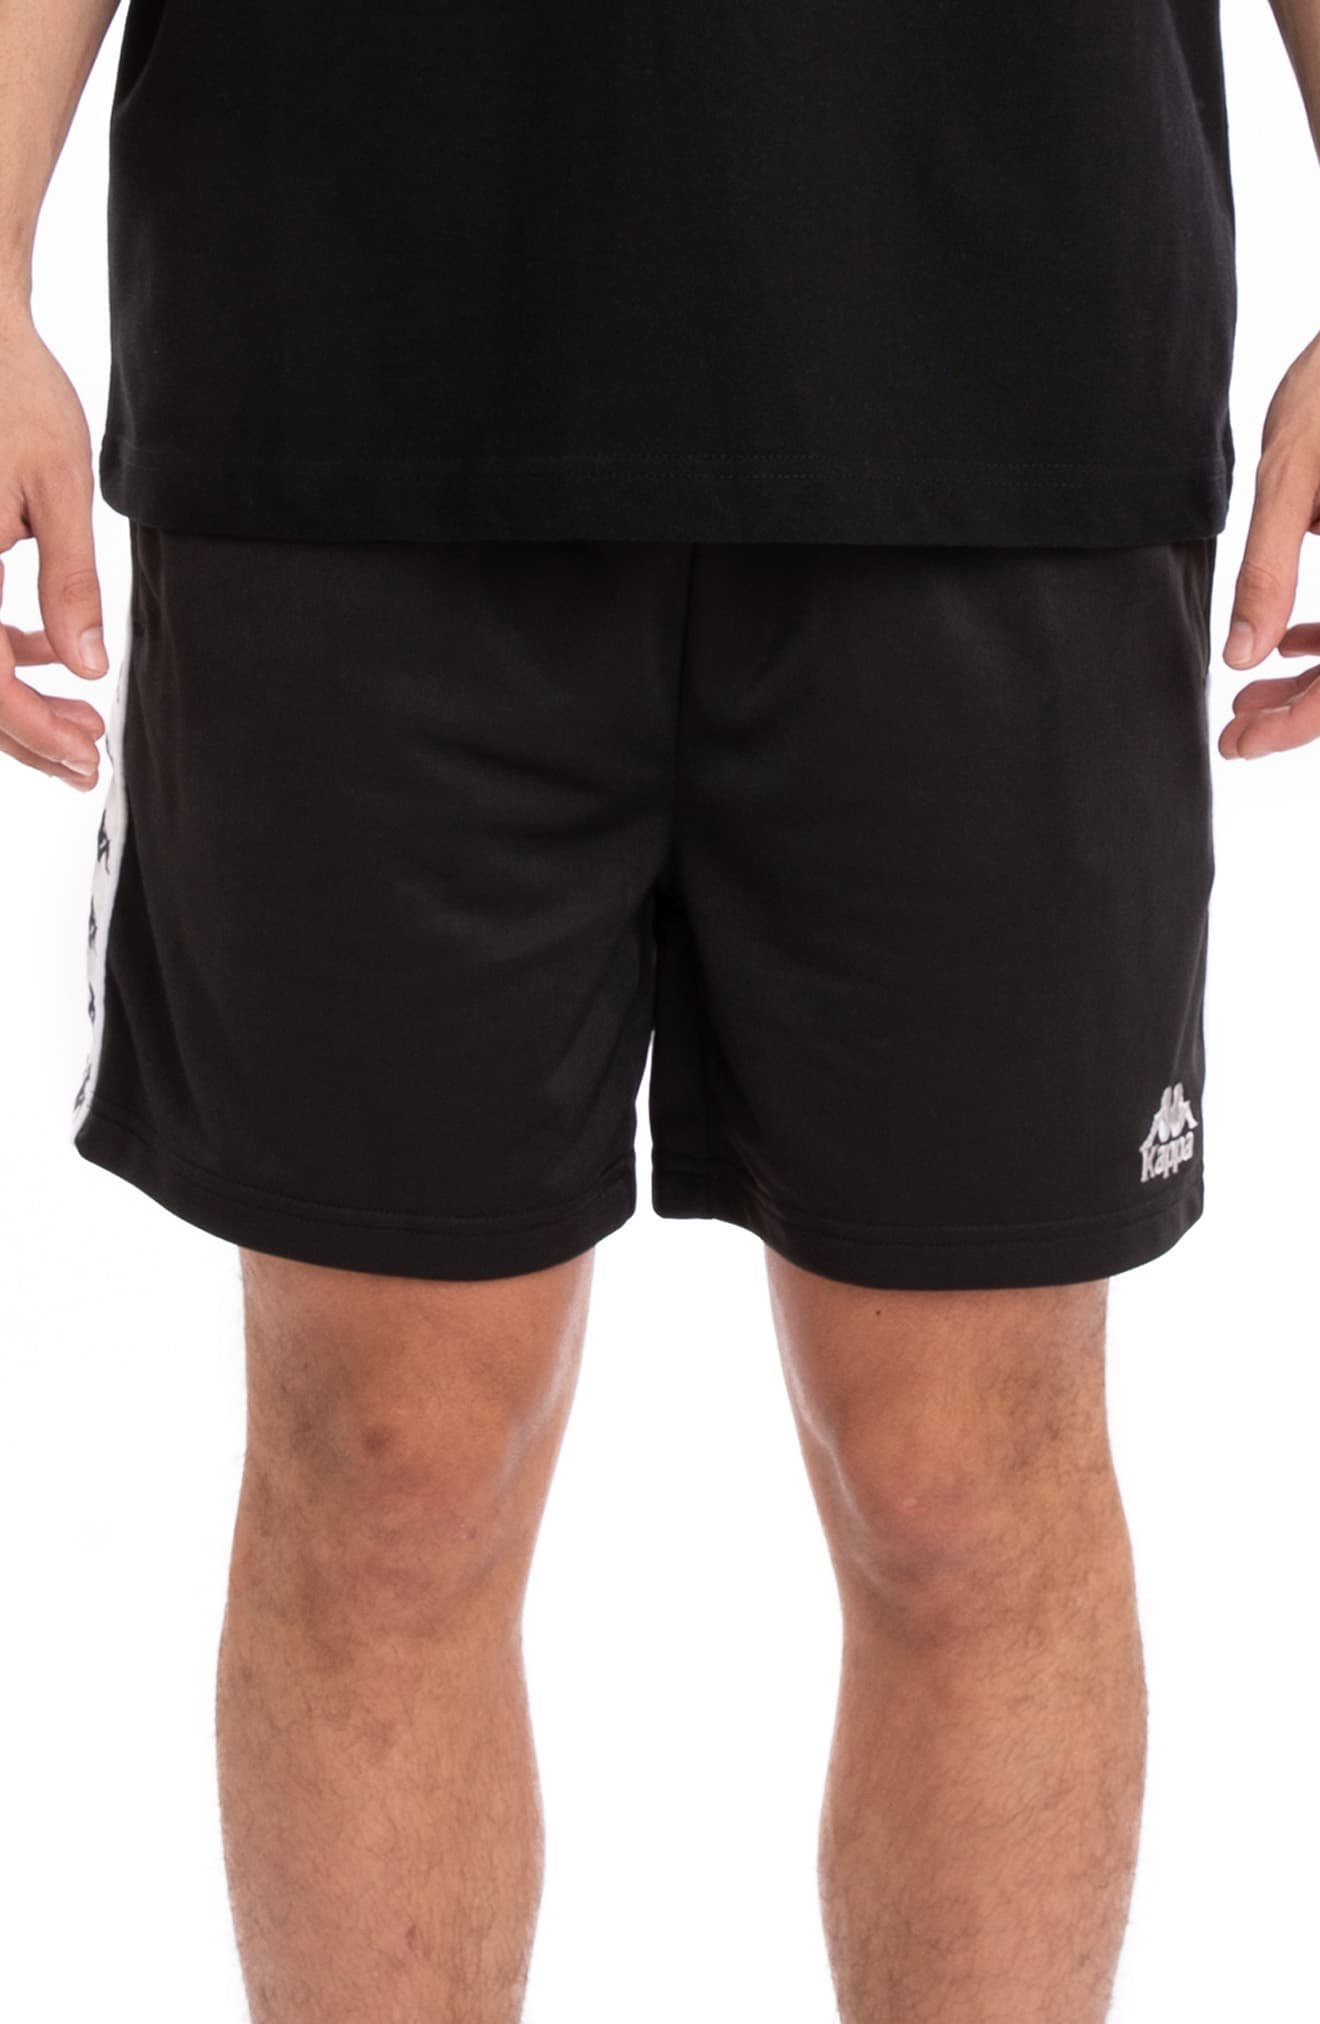 24a4f3b6 Men's Kappa 222 Banda Cole Athletic Shorts, Size Small - Black in ...